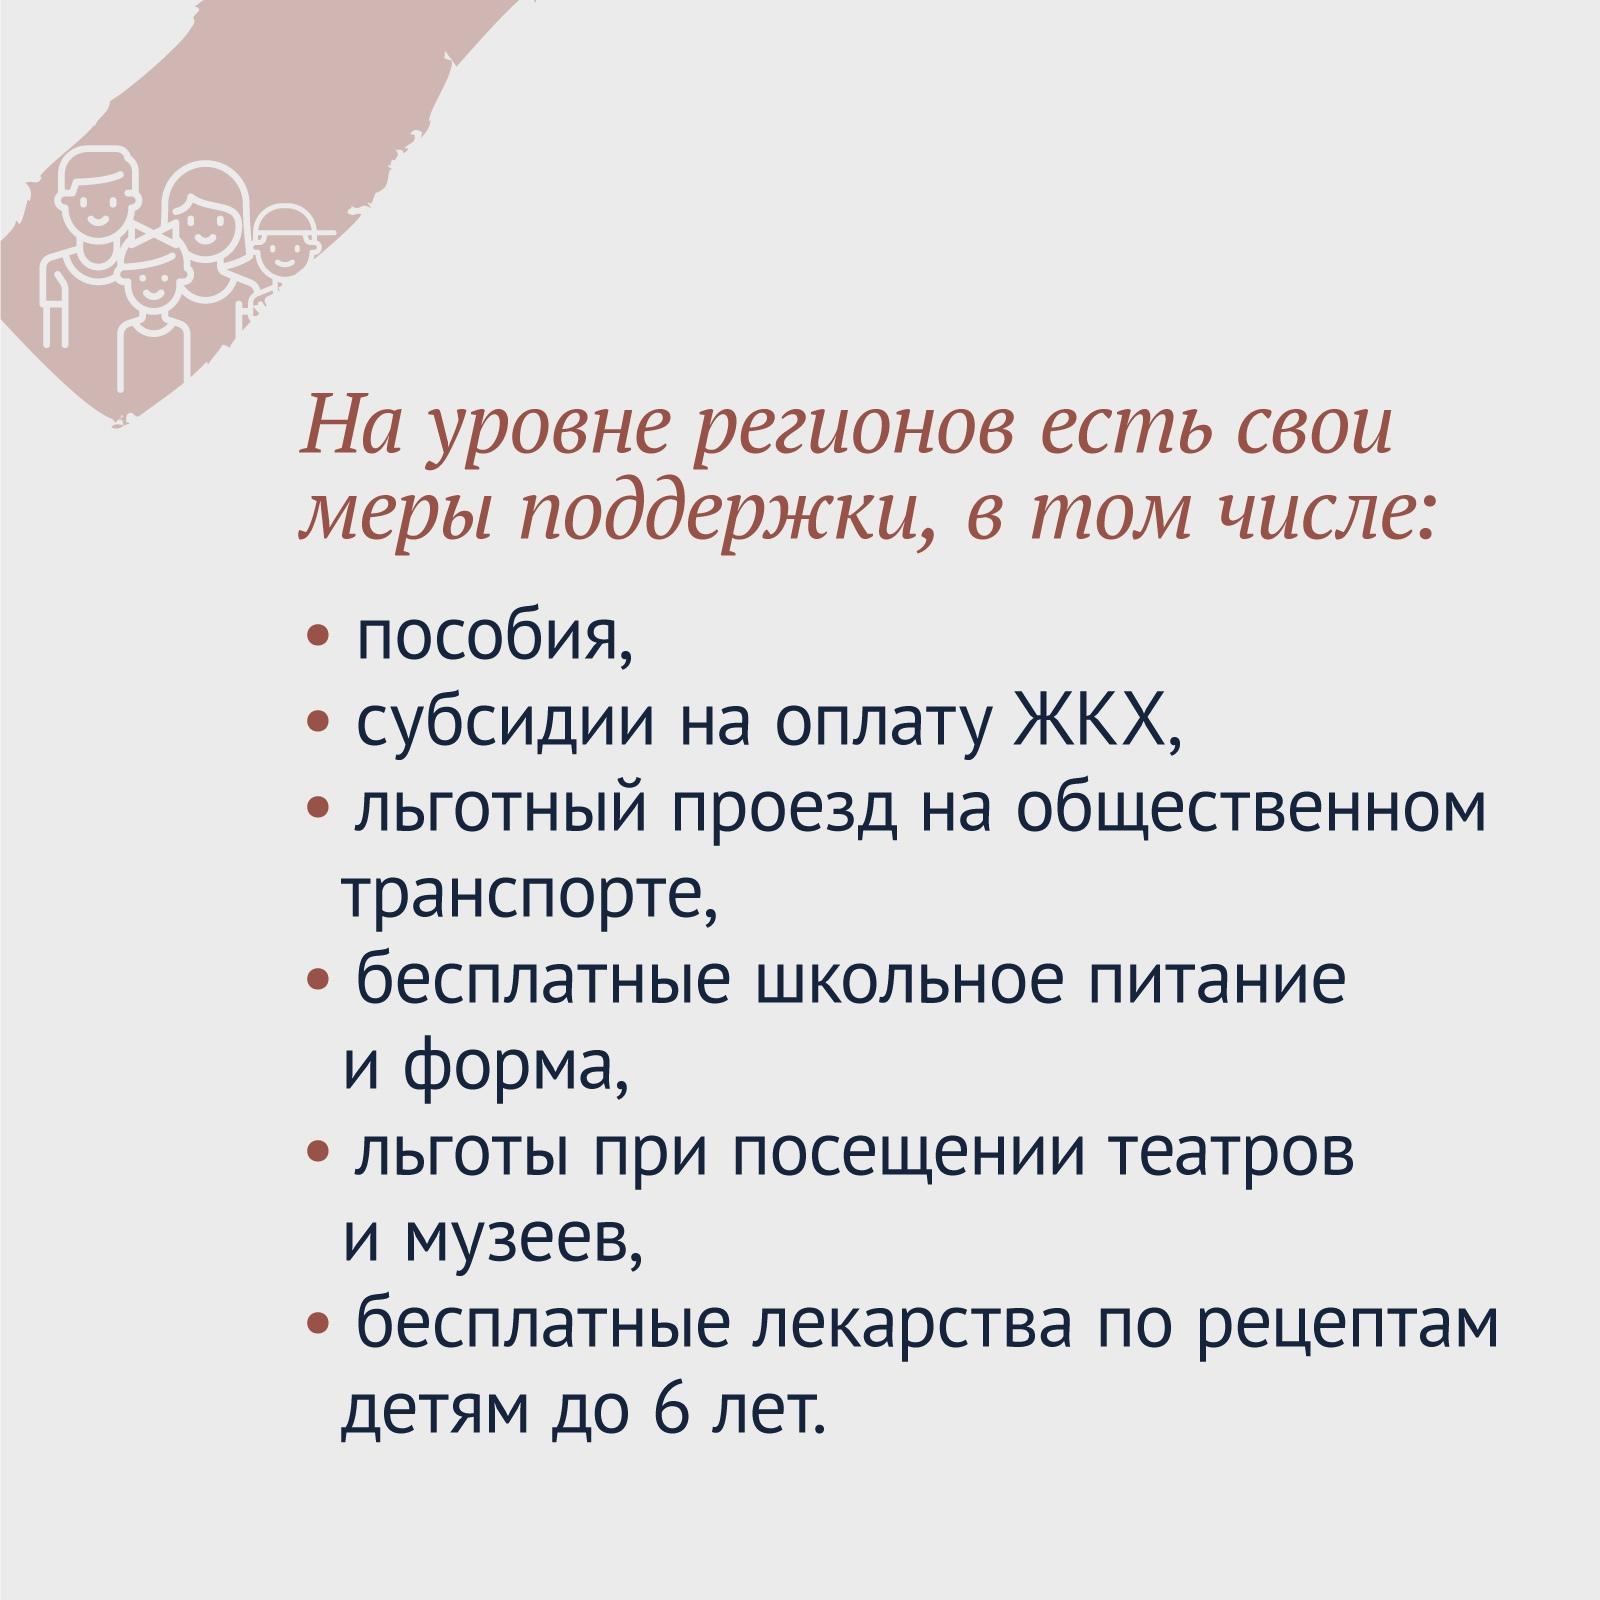 https://sun7-6.userapi.com/c858032/v858032646/16a53c/K3_j3SJriMs.jpg